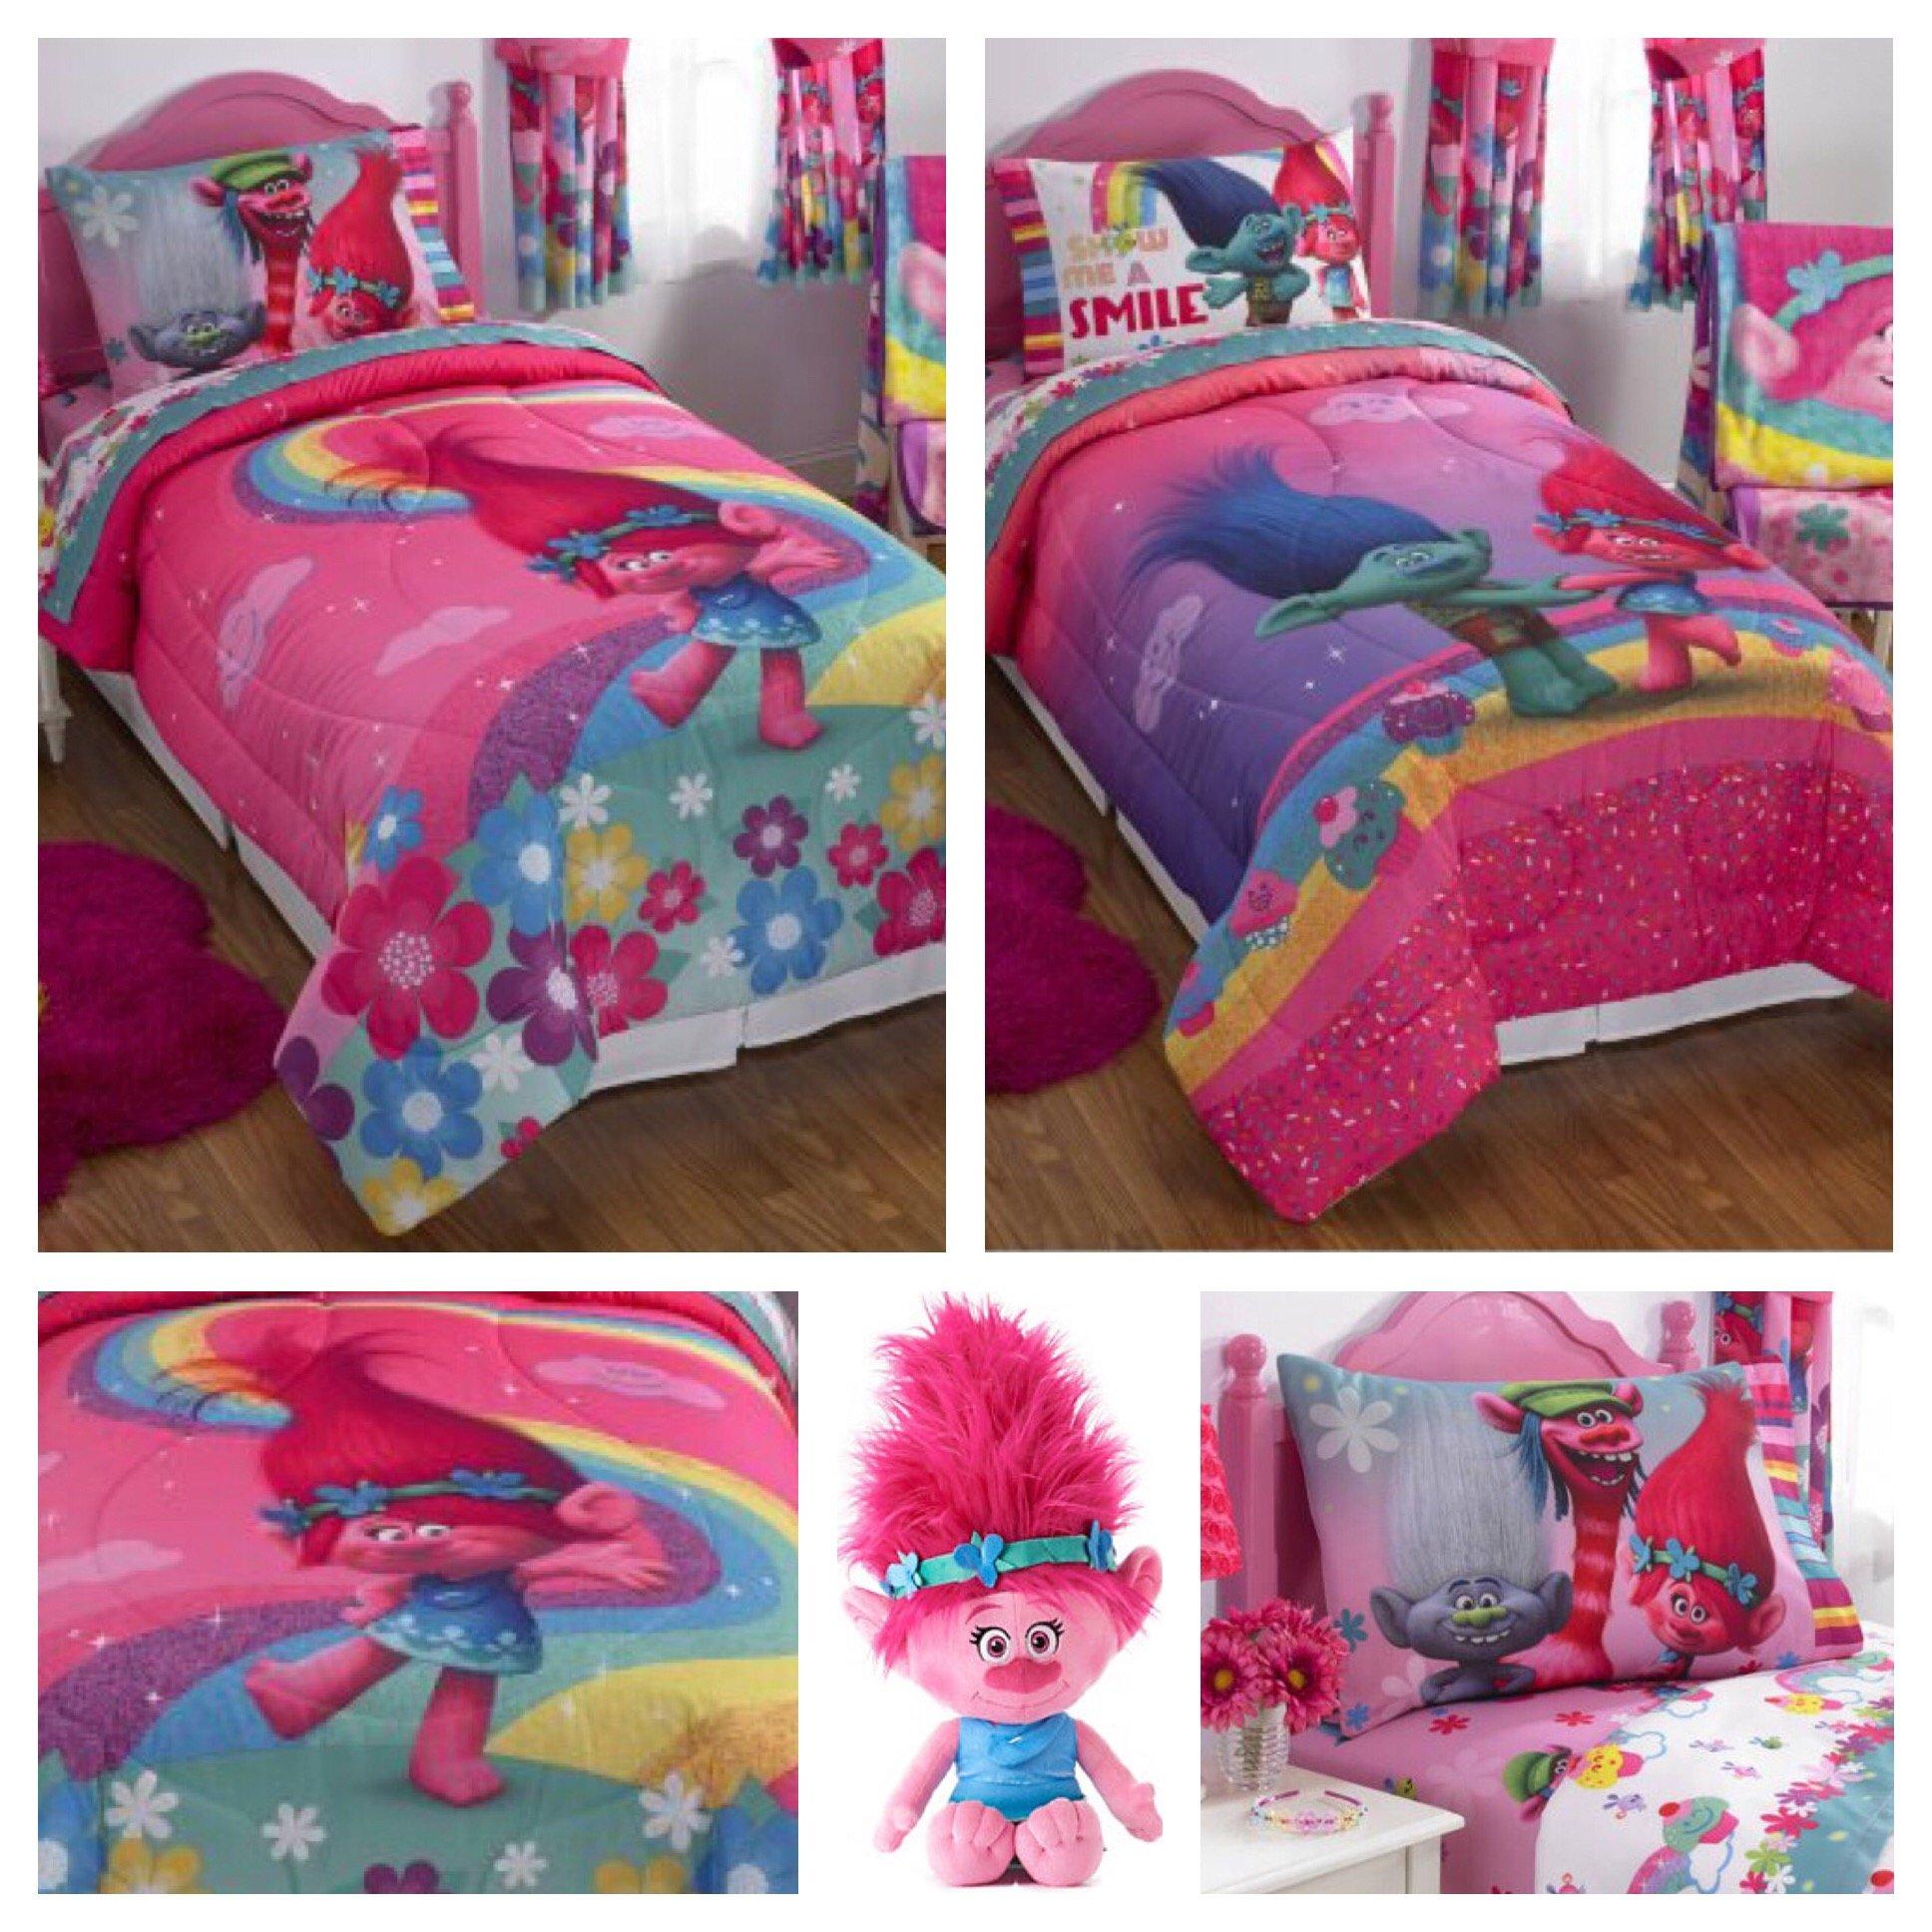 Trolls Girls Complete Bedding Comforter Set with Poppy Plush Pillow Buddy - Full